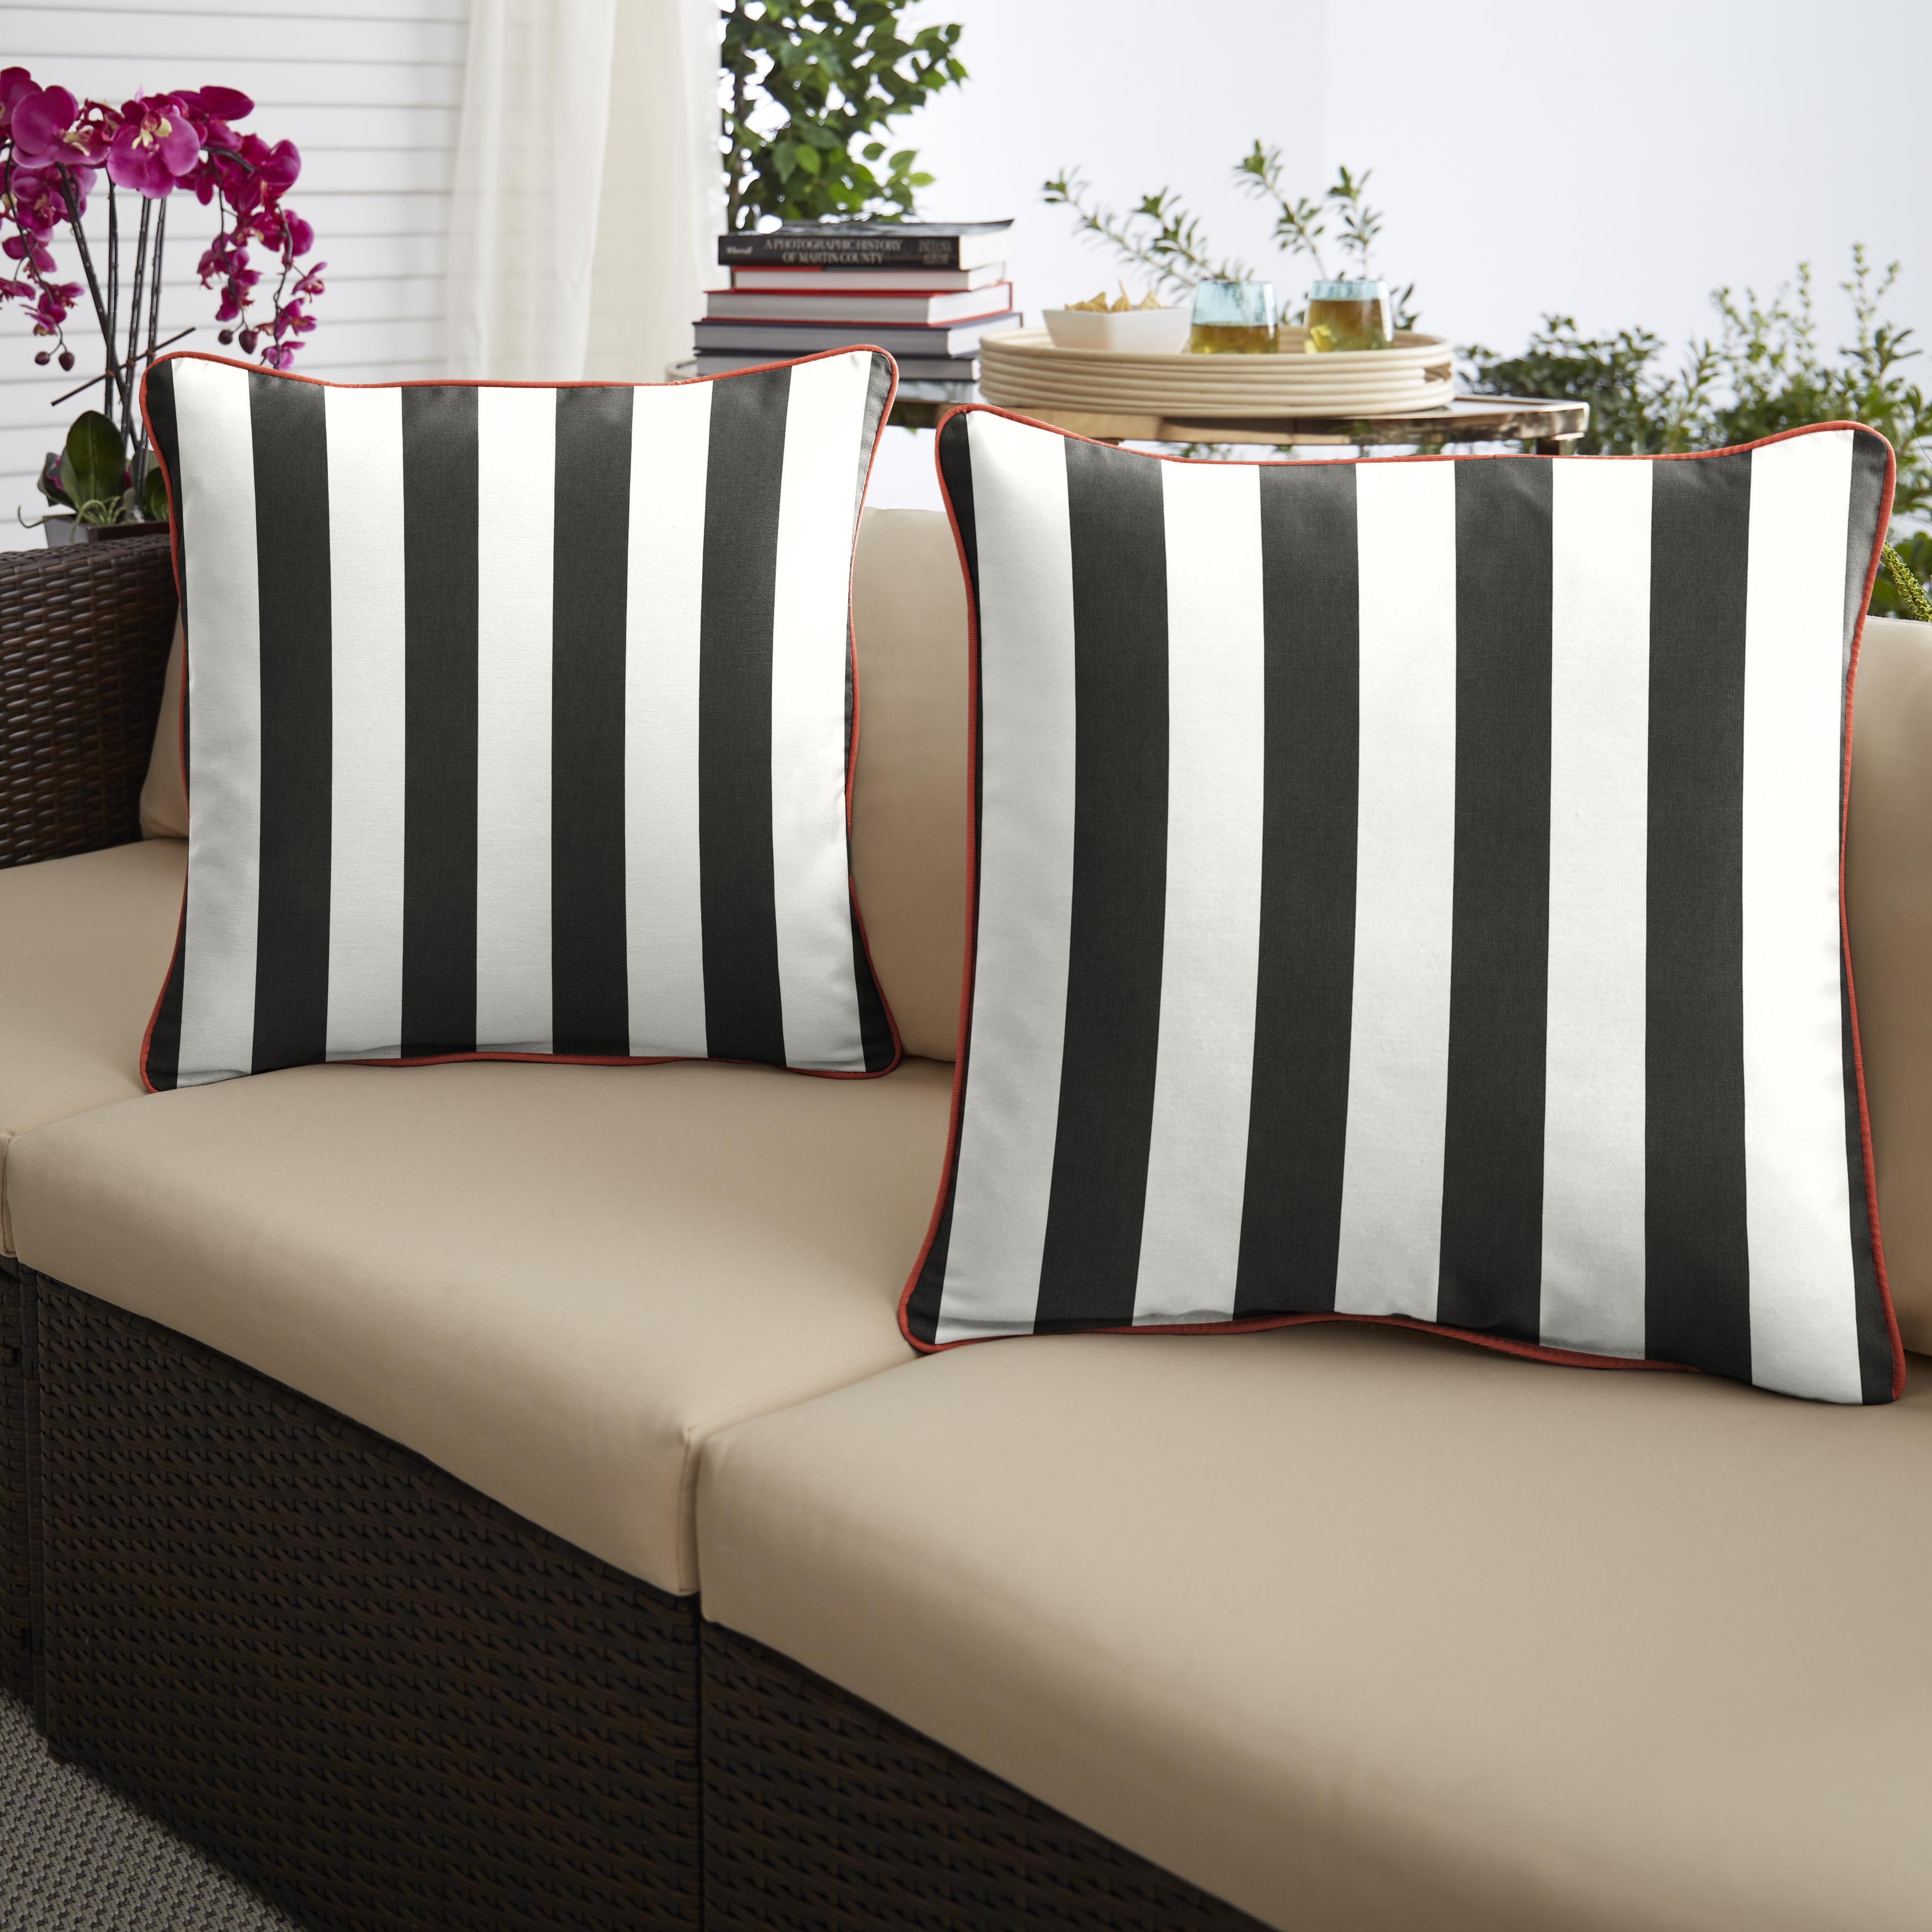 Sunbrella Cabana Classic/Canvas Melon Set of 2 Outdoor Pillows